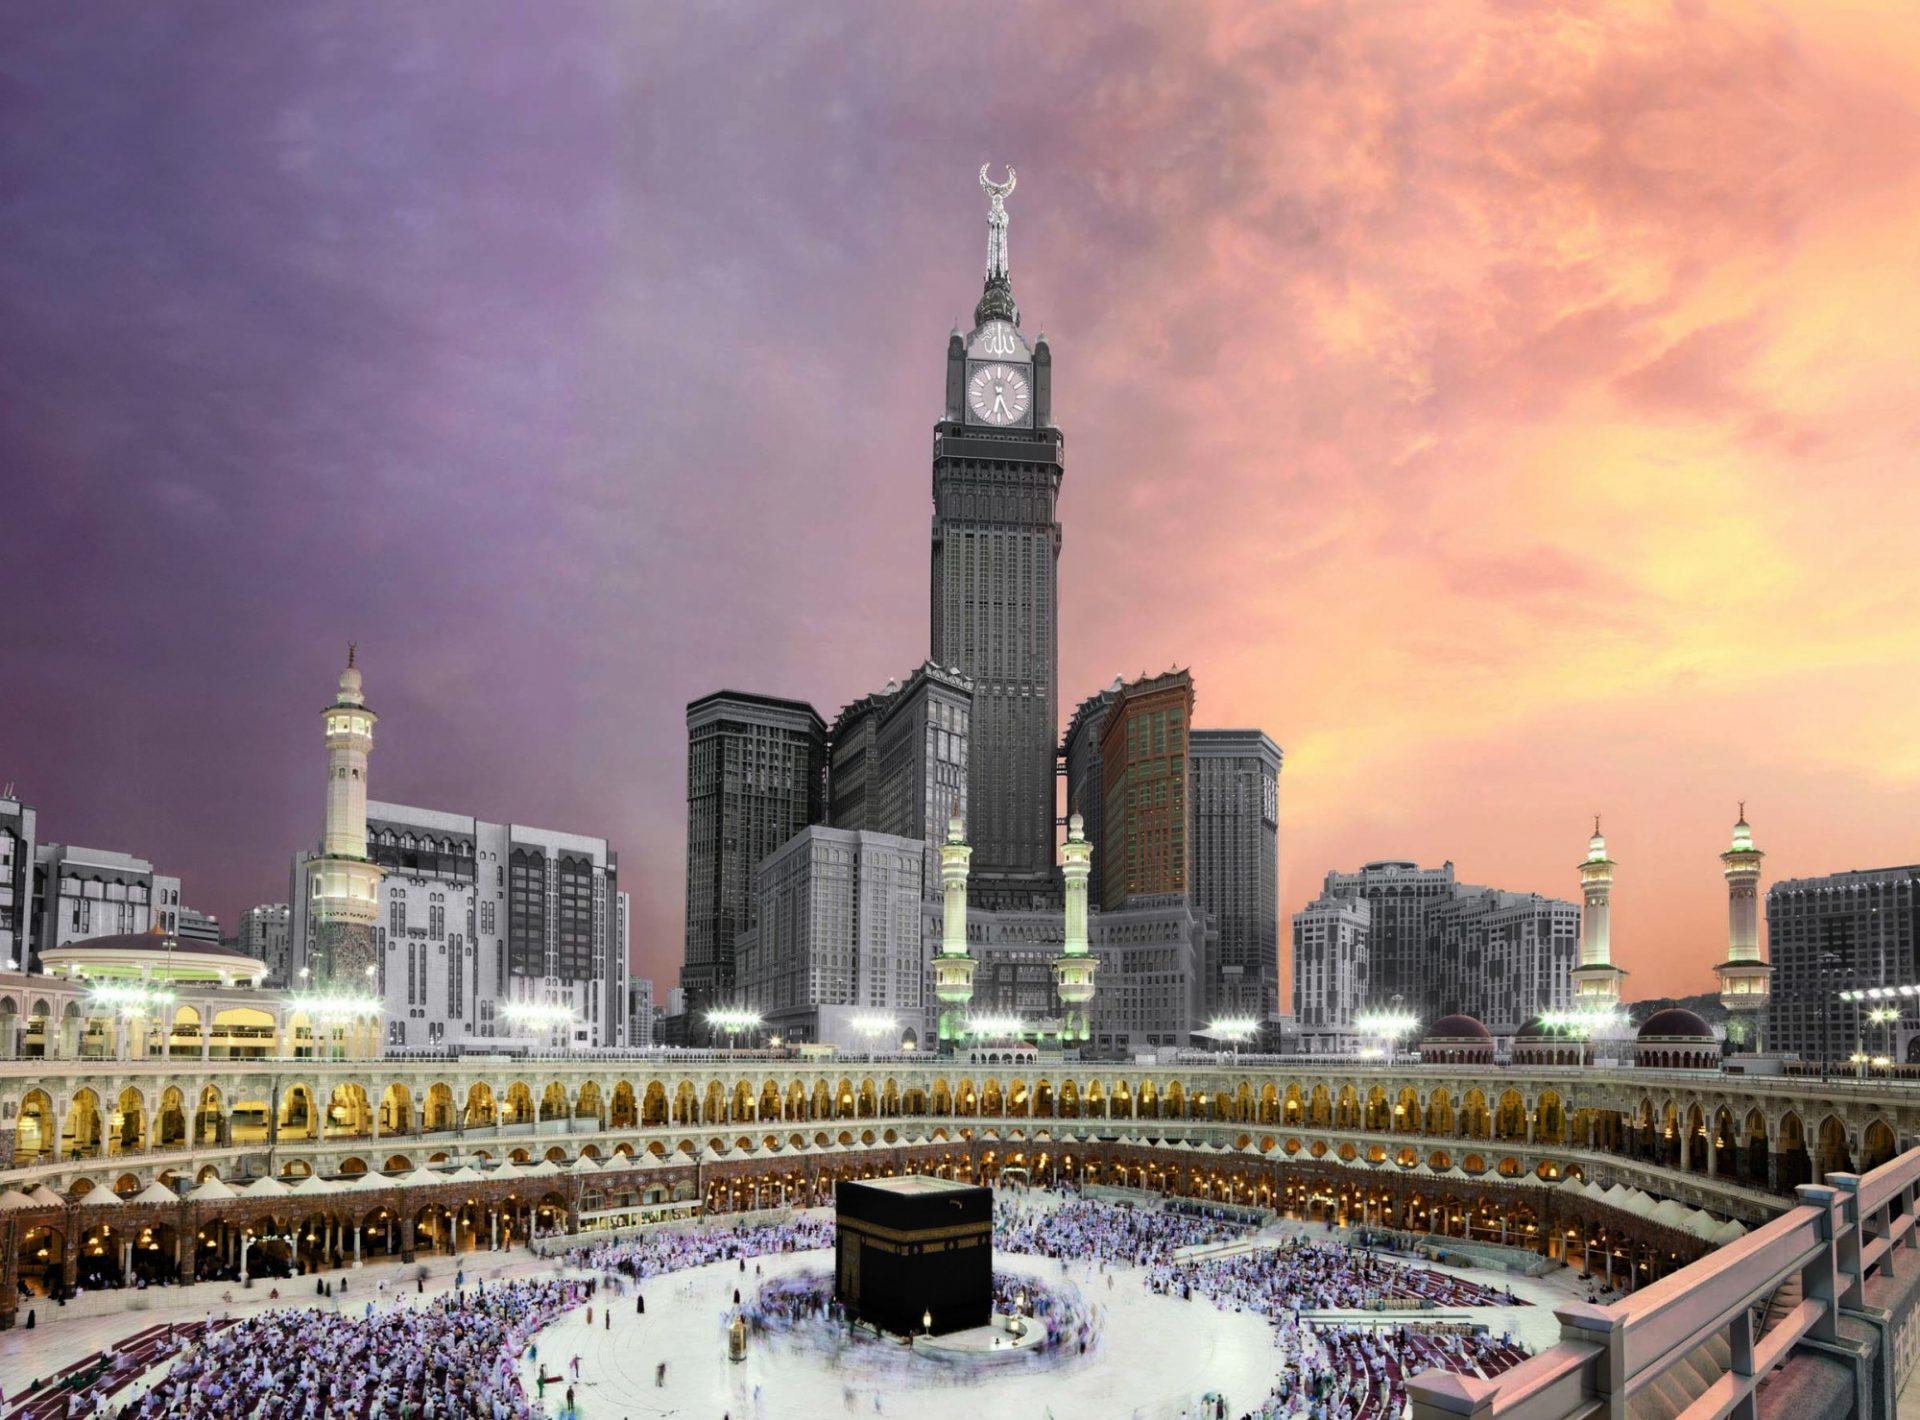 Raffles_Makkah_Palace_Exterior_709097_standard